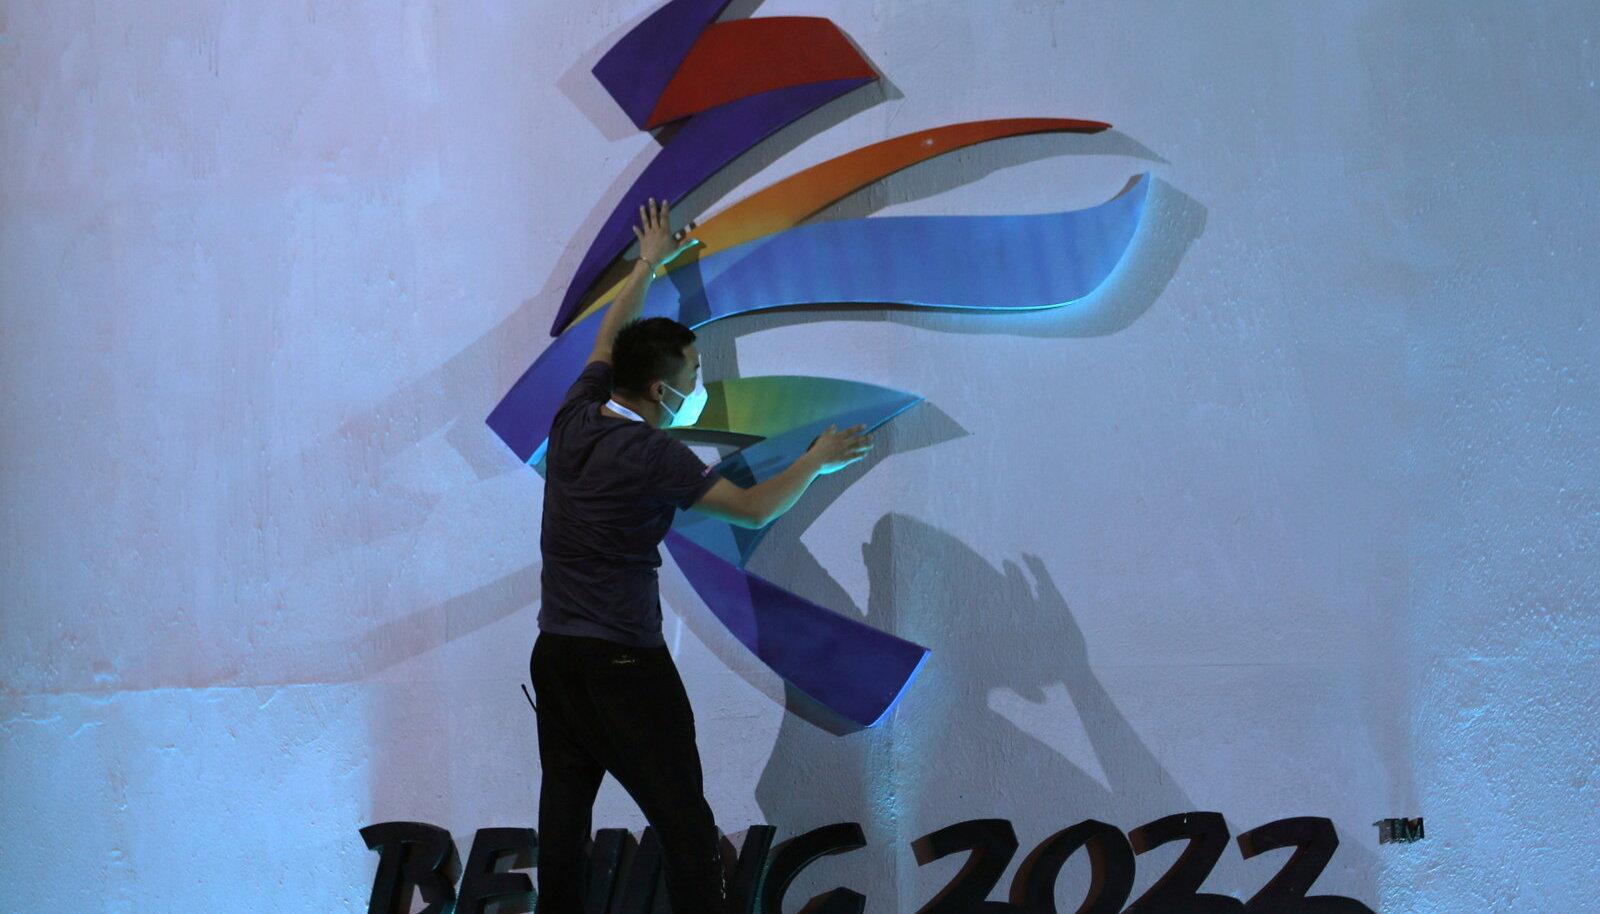 Pekingi olümpia 2022 logo